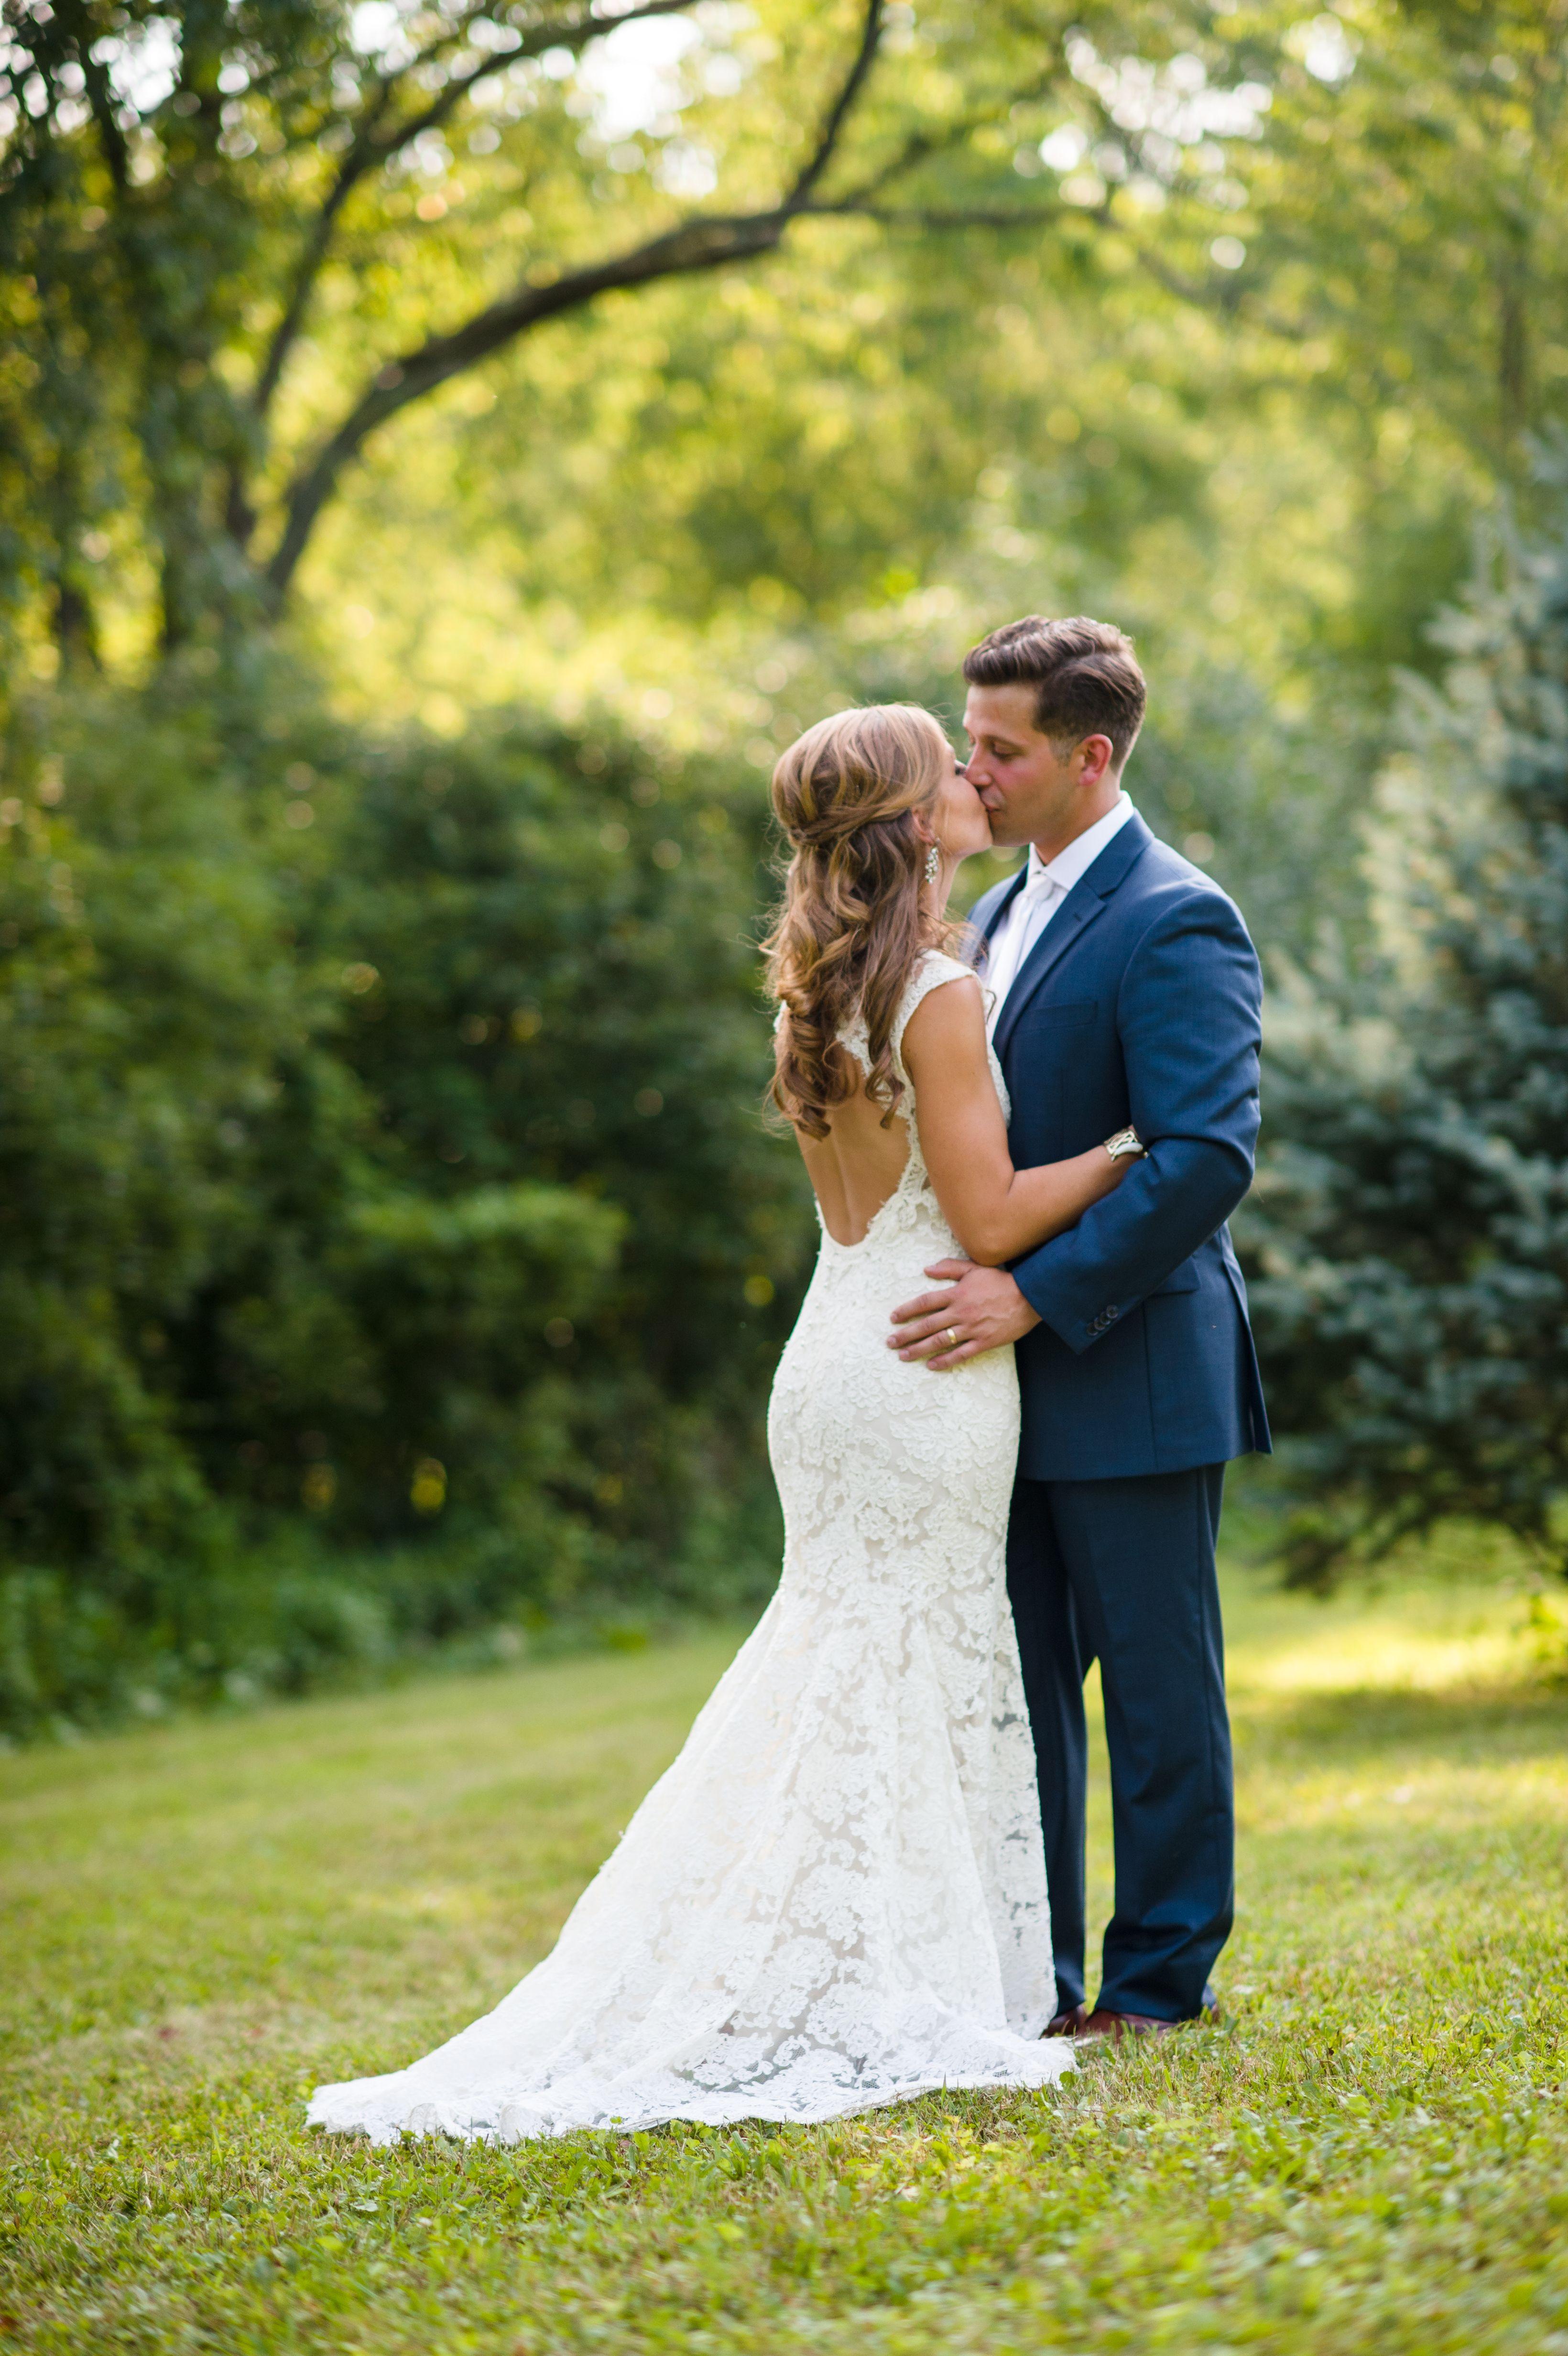 Keyhole Lace Dress For Summer Outdoor Wedding Sooo Pretty Summer Wedding Outdoor Sheath Wedding Dress Summer Dresses [ 4928 x 3280 Pixel ]